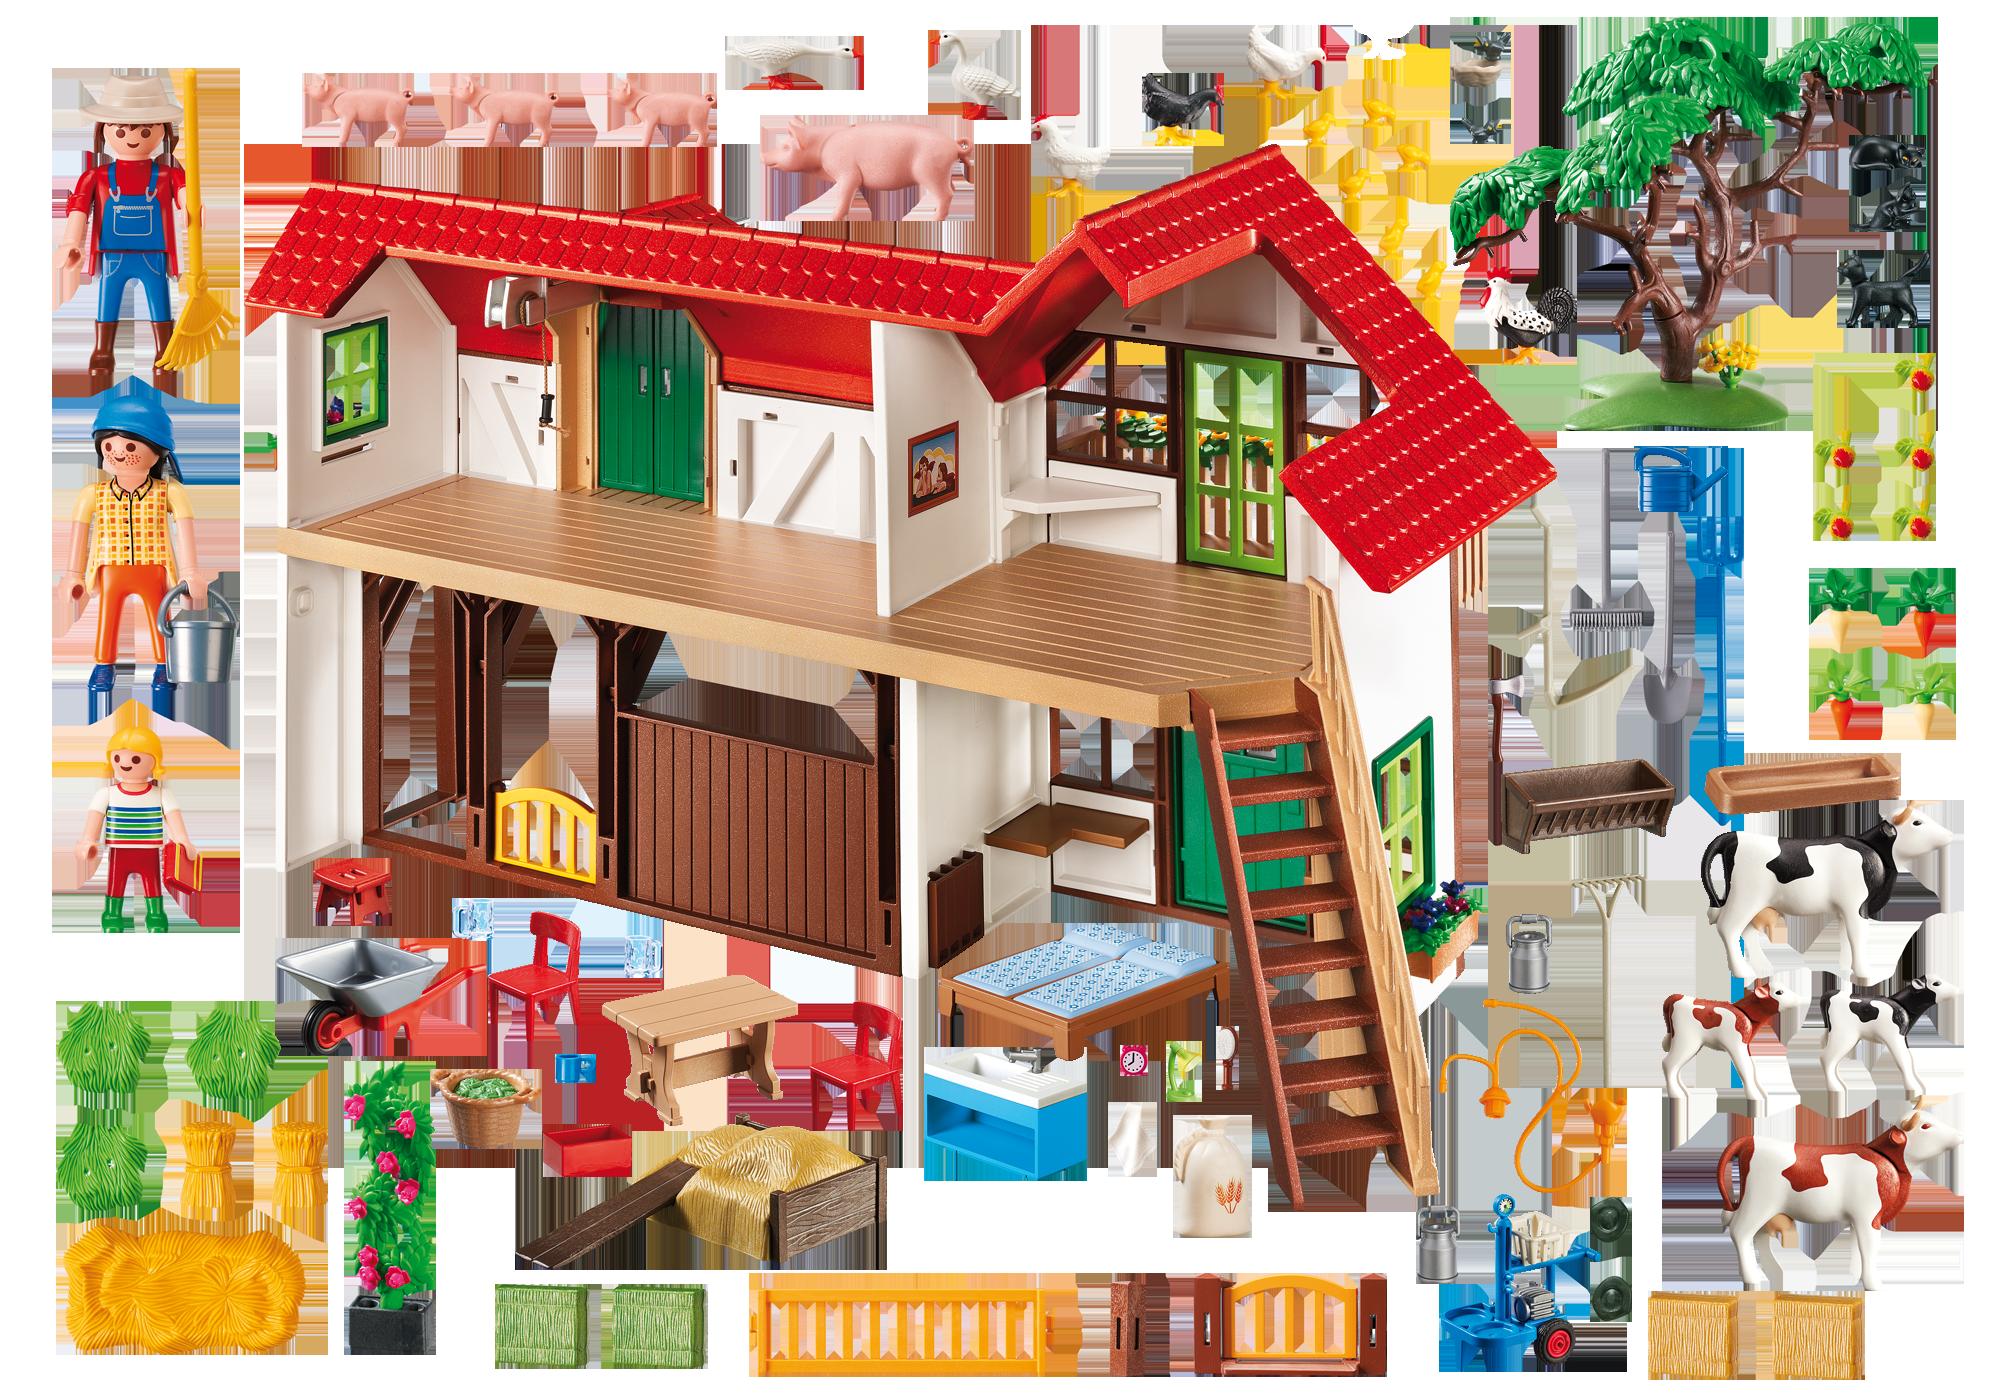 Large Farm - 6120 - PLAYMOBIL® United Kingdom for Farmhouse Playmobil  76uhy